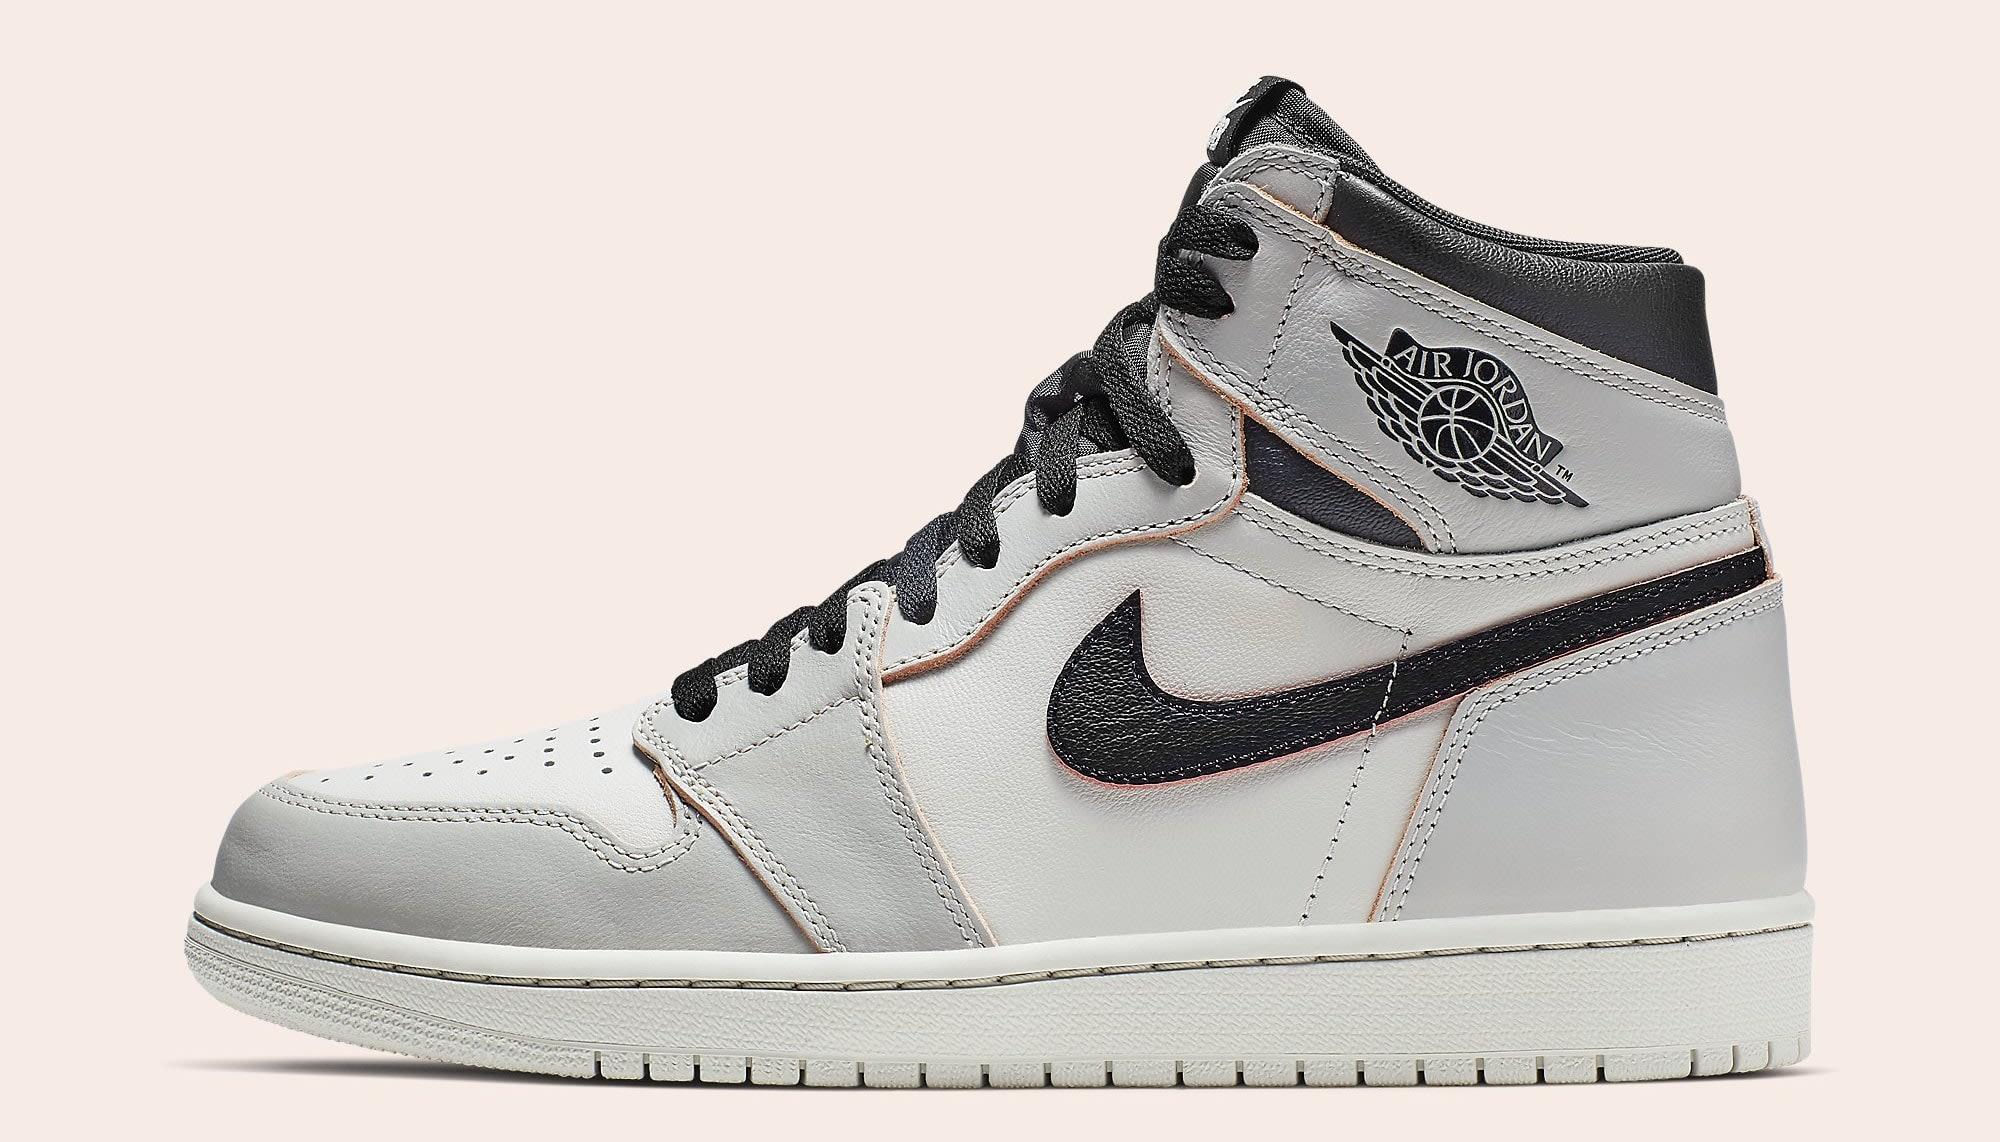 Nike SB x Air Jordan 1 'NYC to Paris'